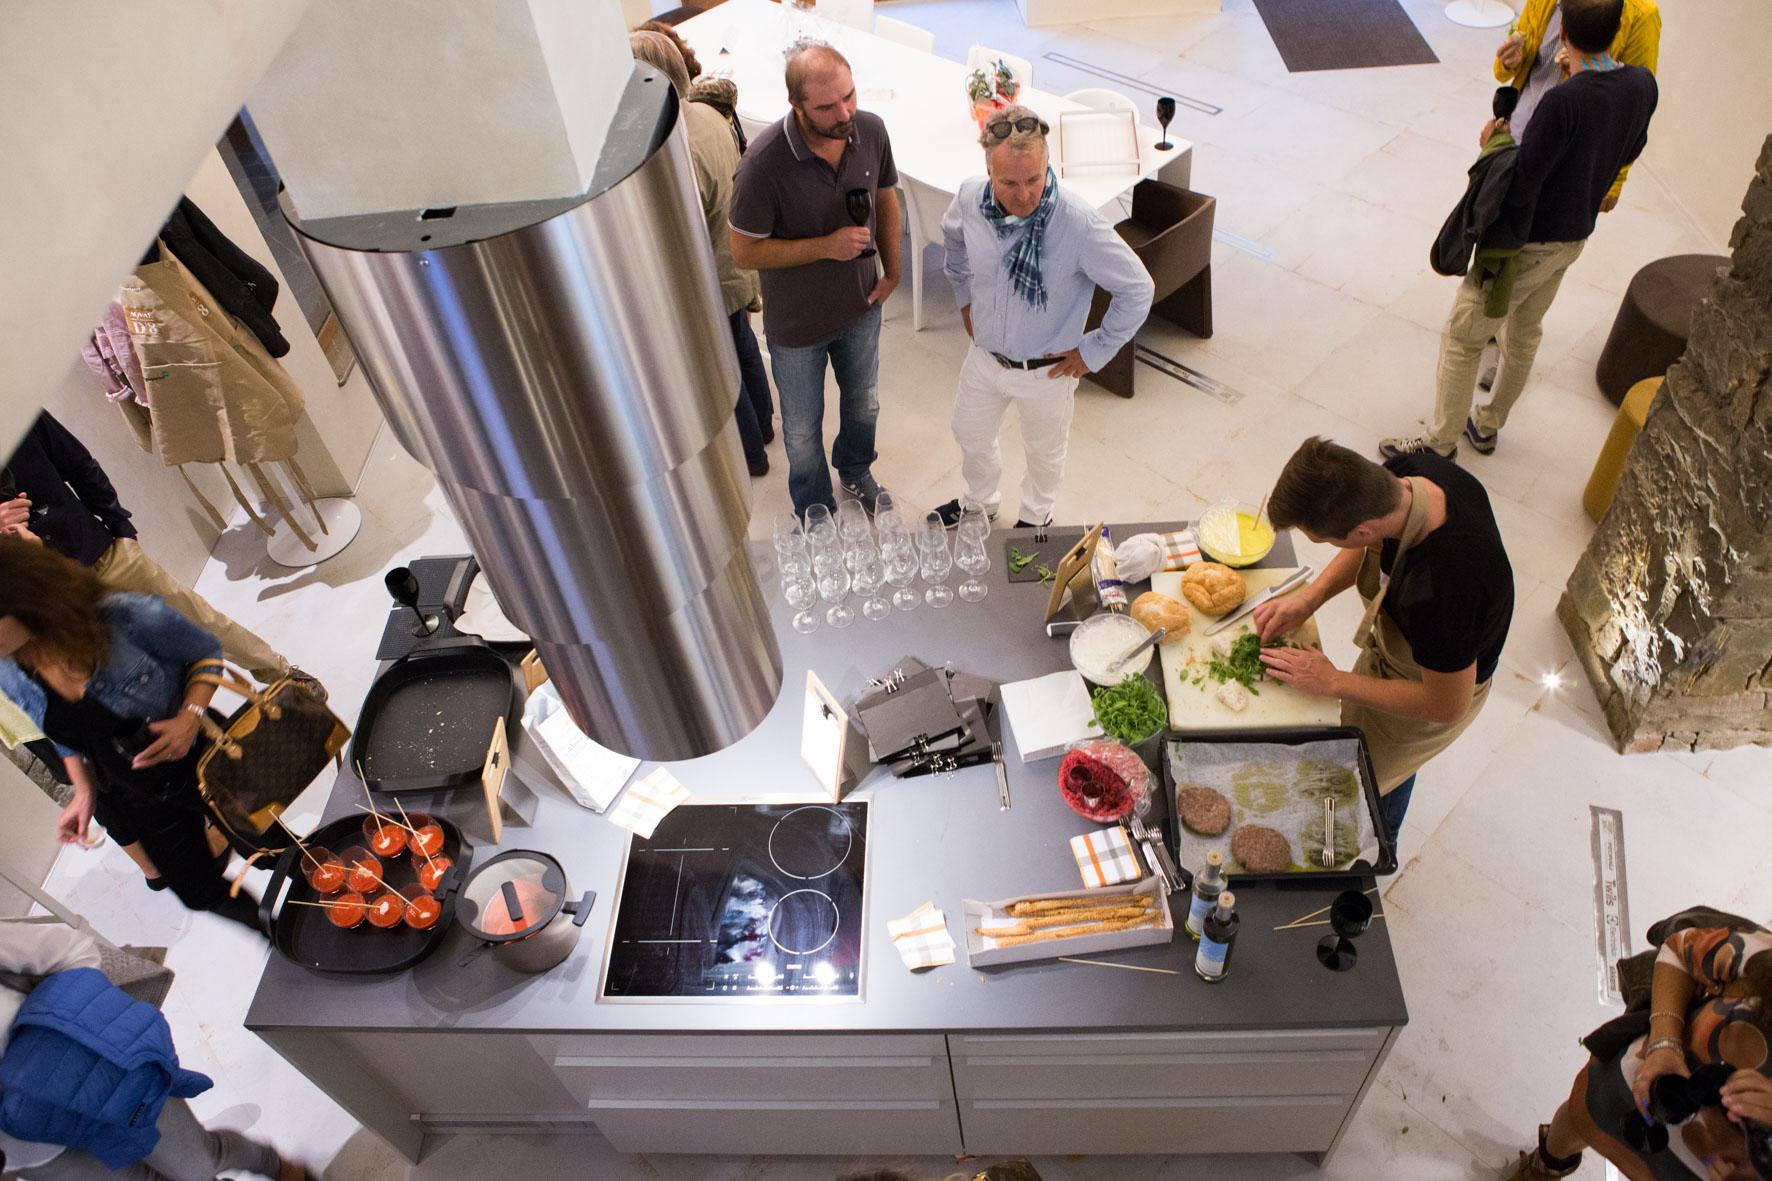 Studio Gasperini - Electrolux Cooking Show